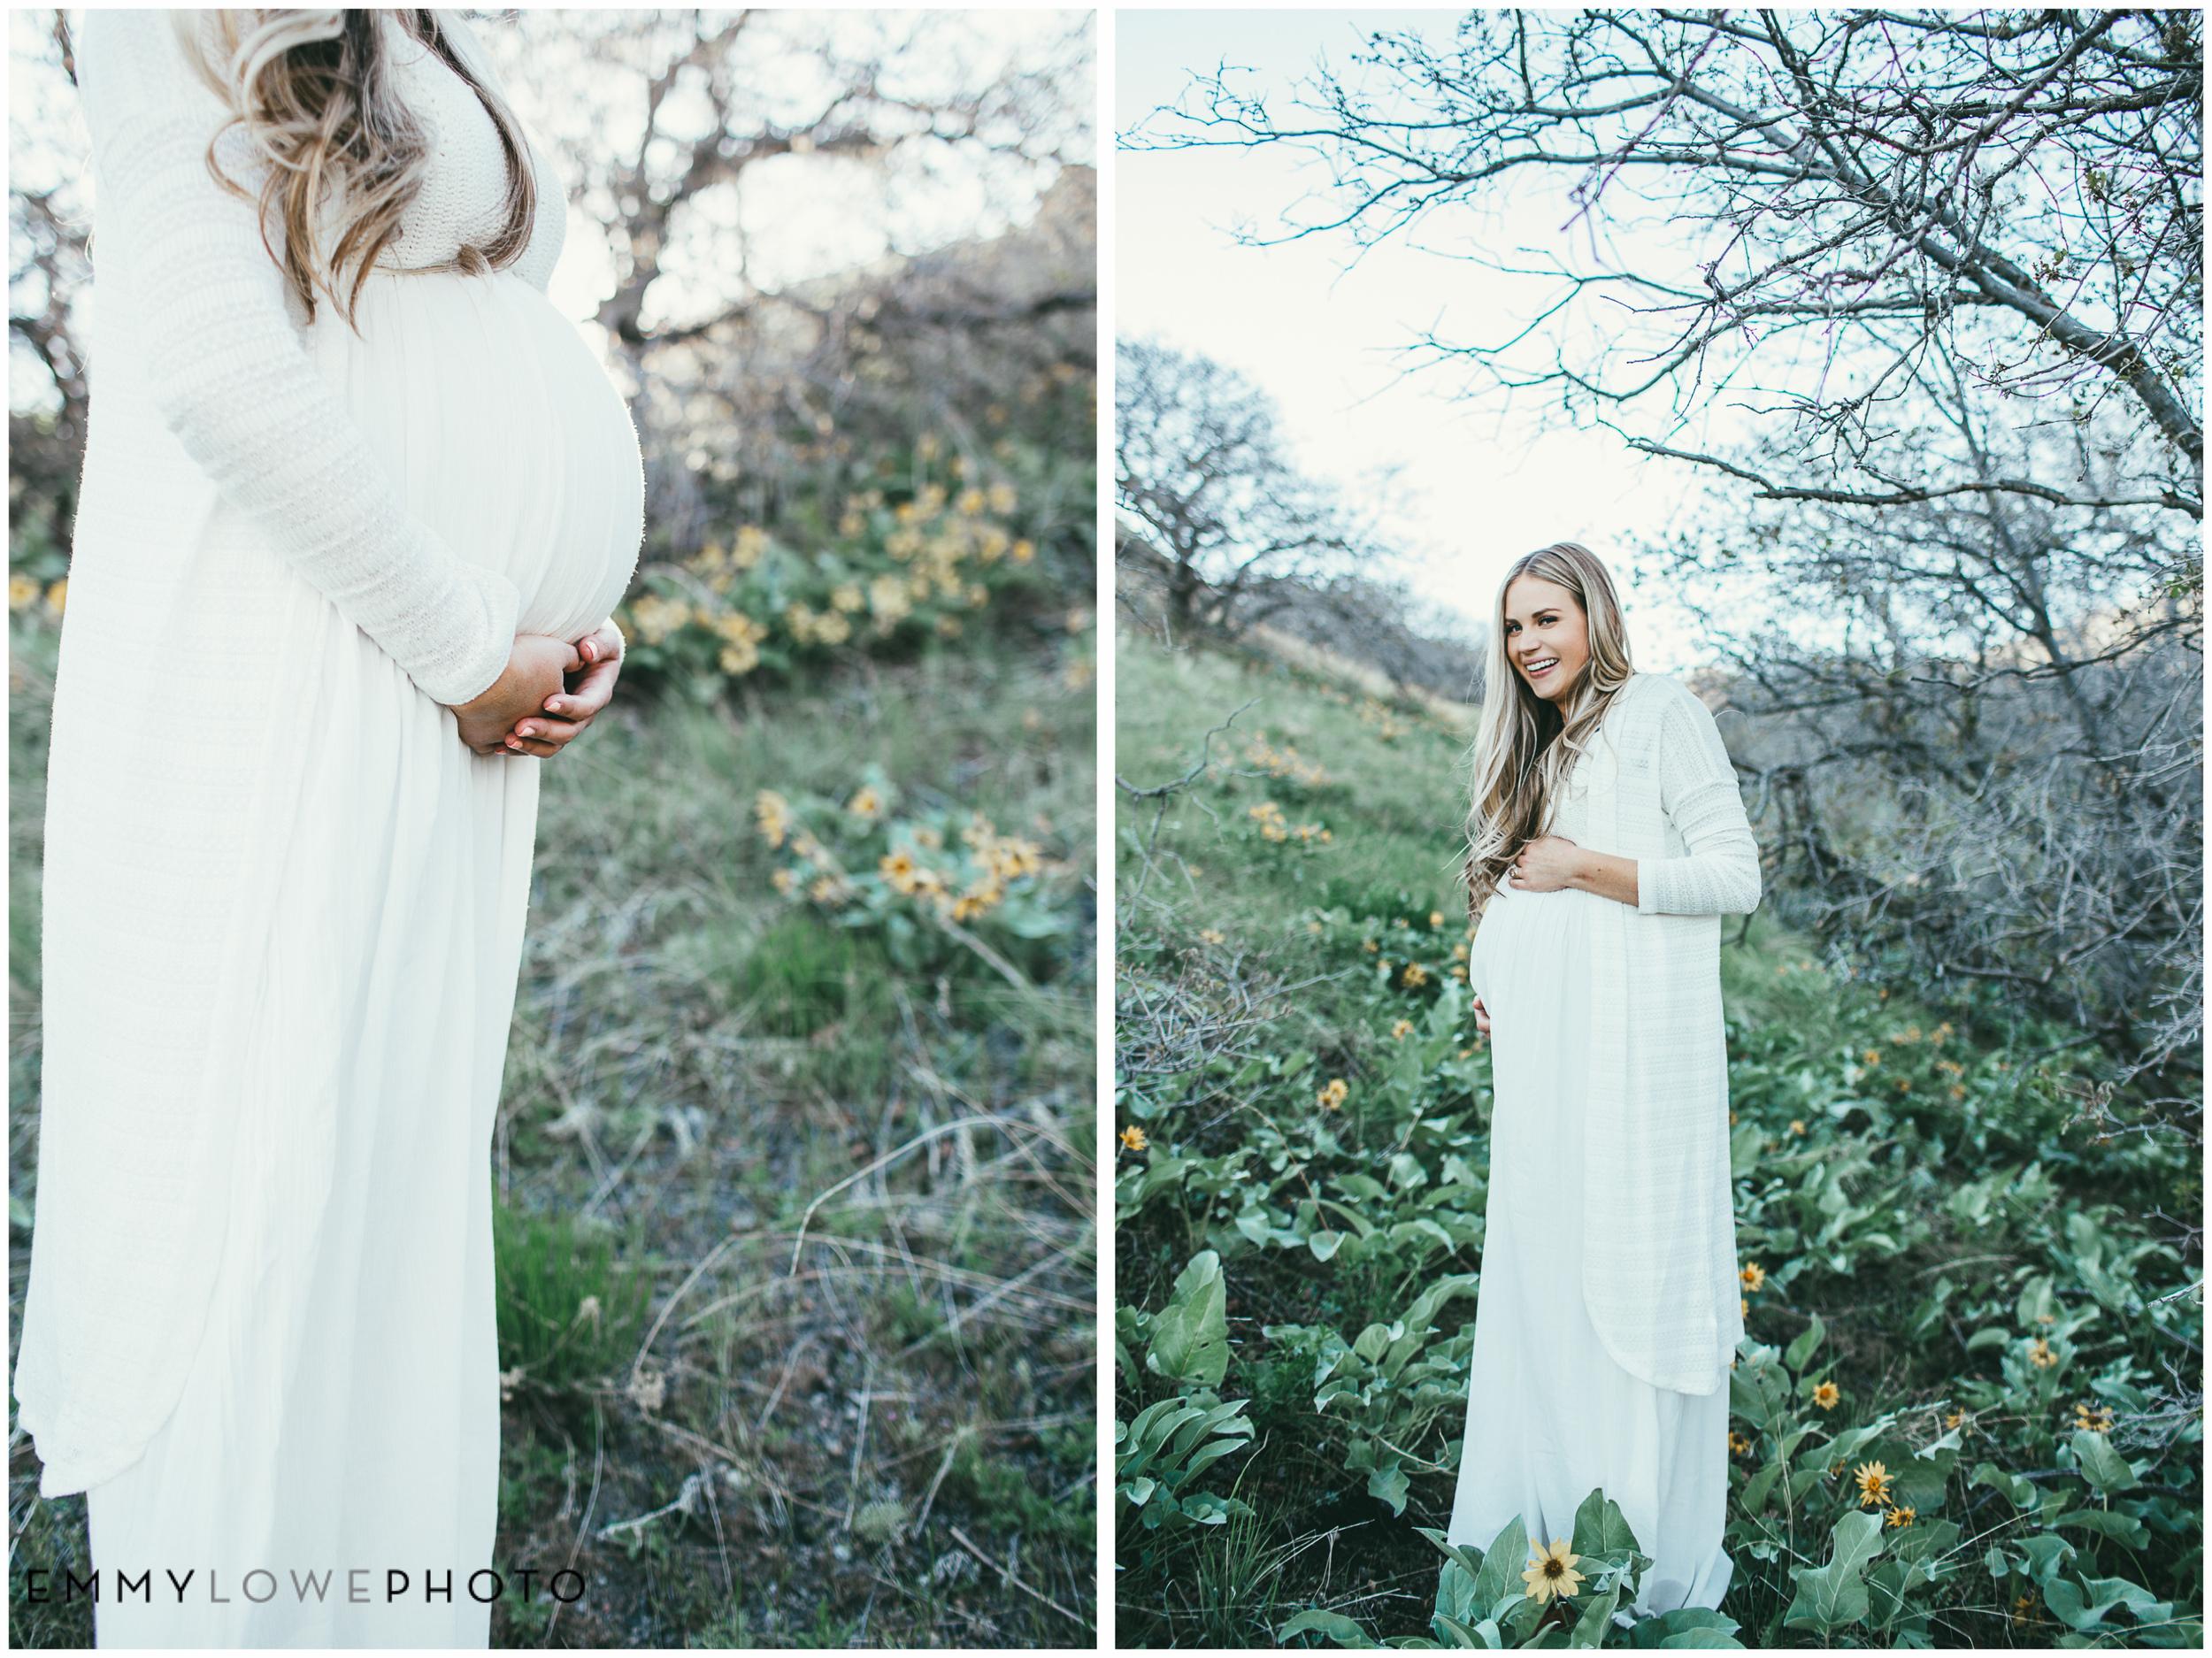 EmmyLowePhotoKateBrownMaternitySaltLakeCityUtah